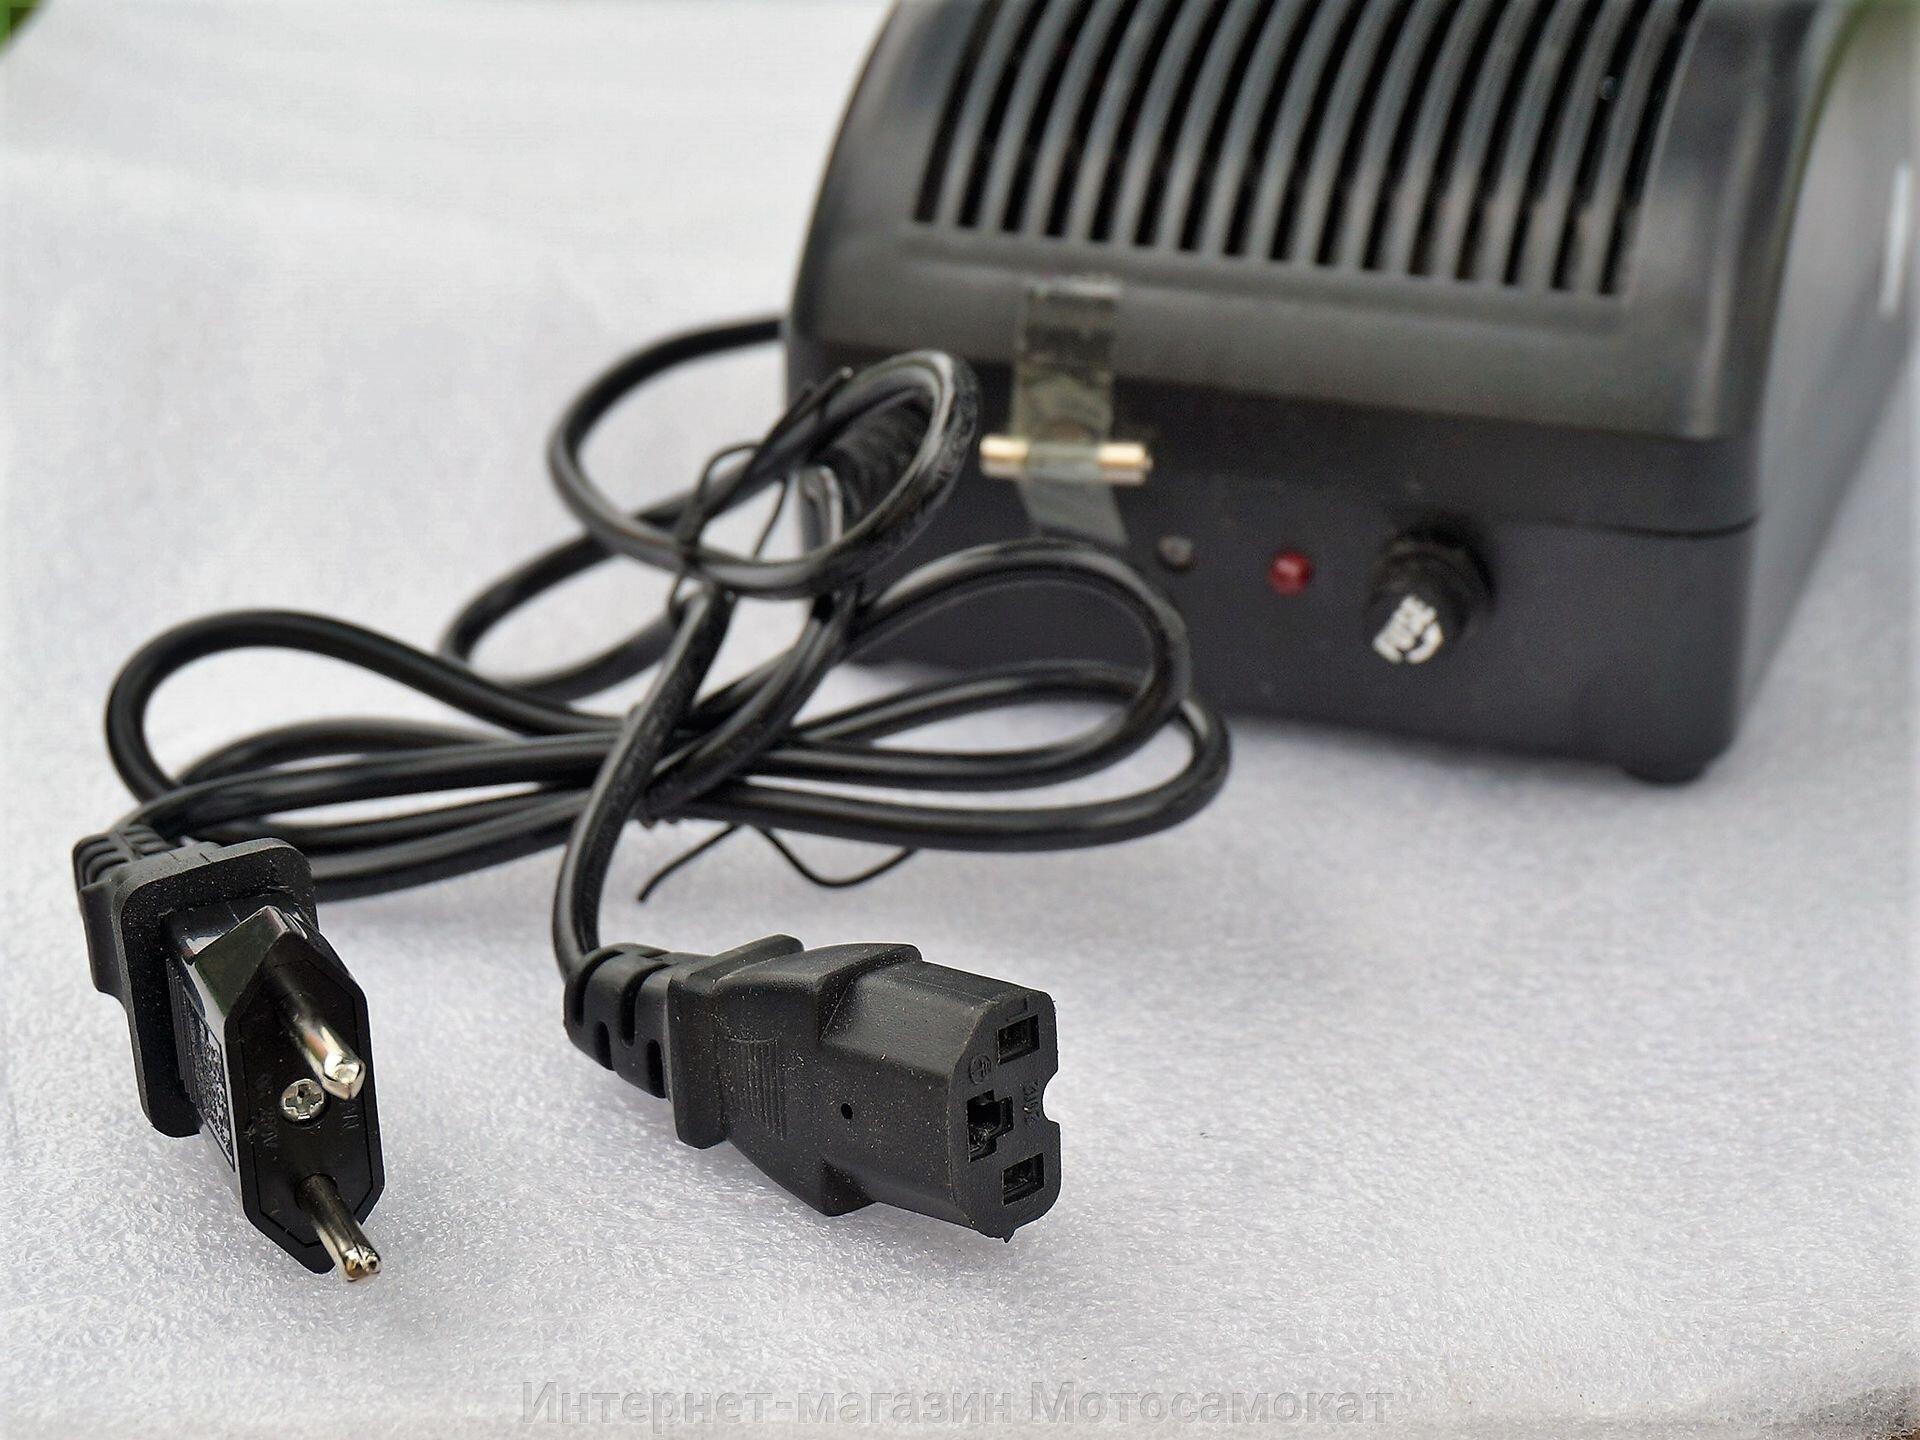 Зарядка LiFePO4 (58.8v) 48 вольт 2 ампера, с защитой от короткого замыкания. - фото Зарядка LiFePO4 (58.8v) 48 вольт 2 ампера, с защитой от короткого замыкания.